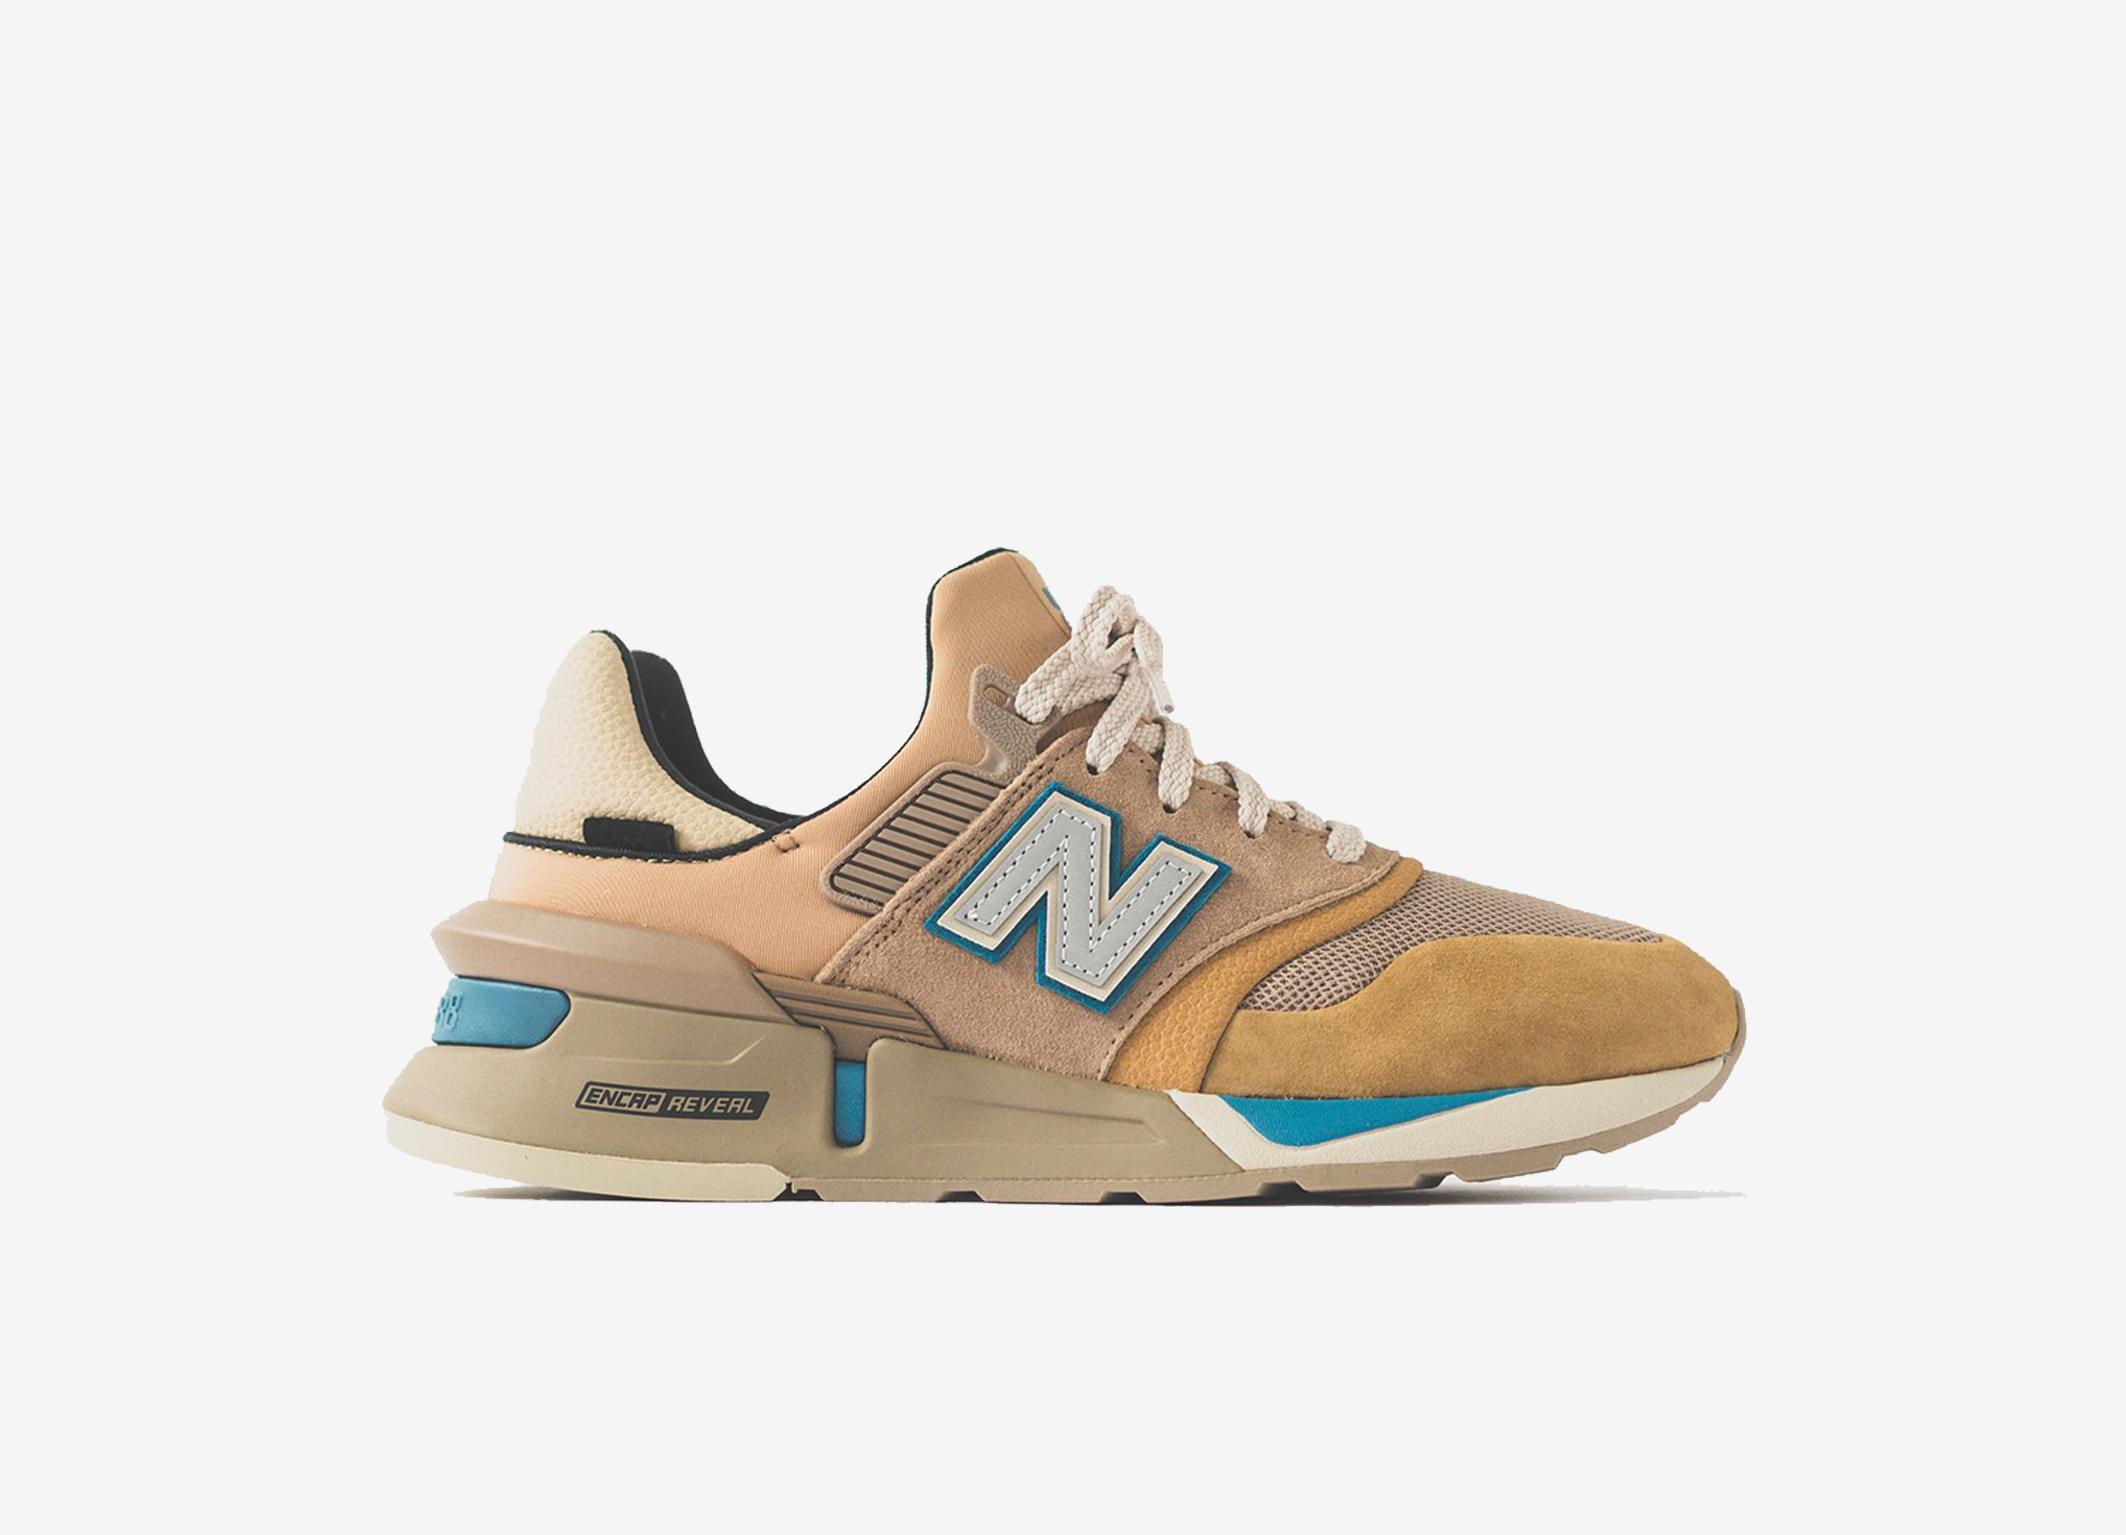 kith x nonnative x new balance 997 sport